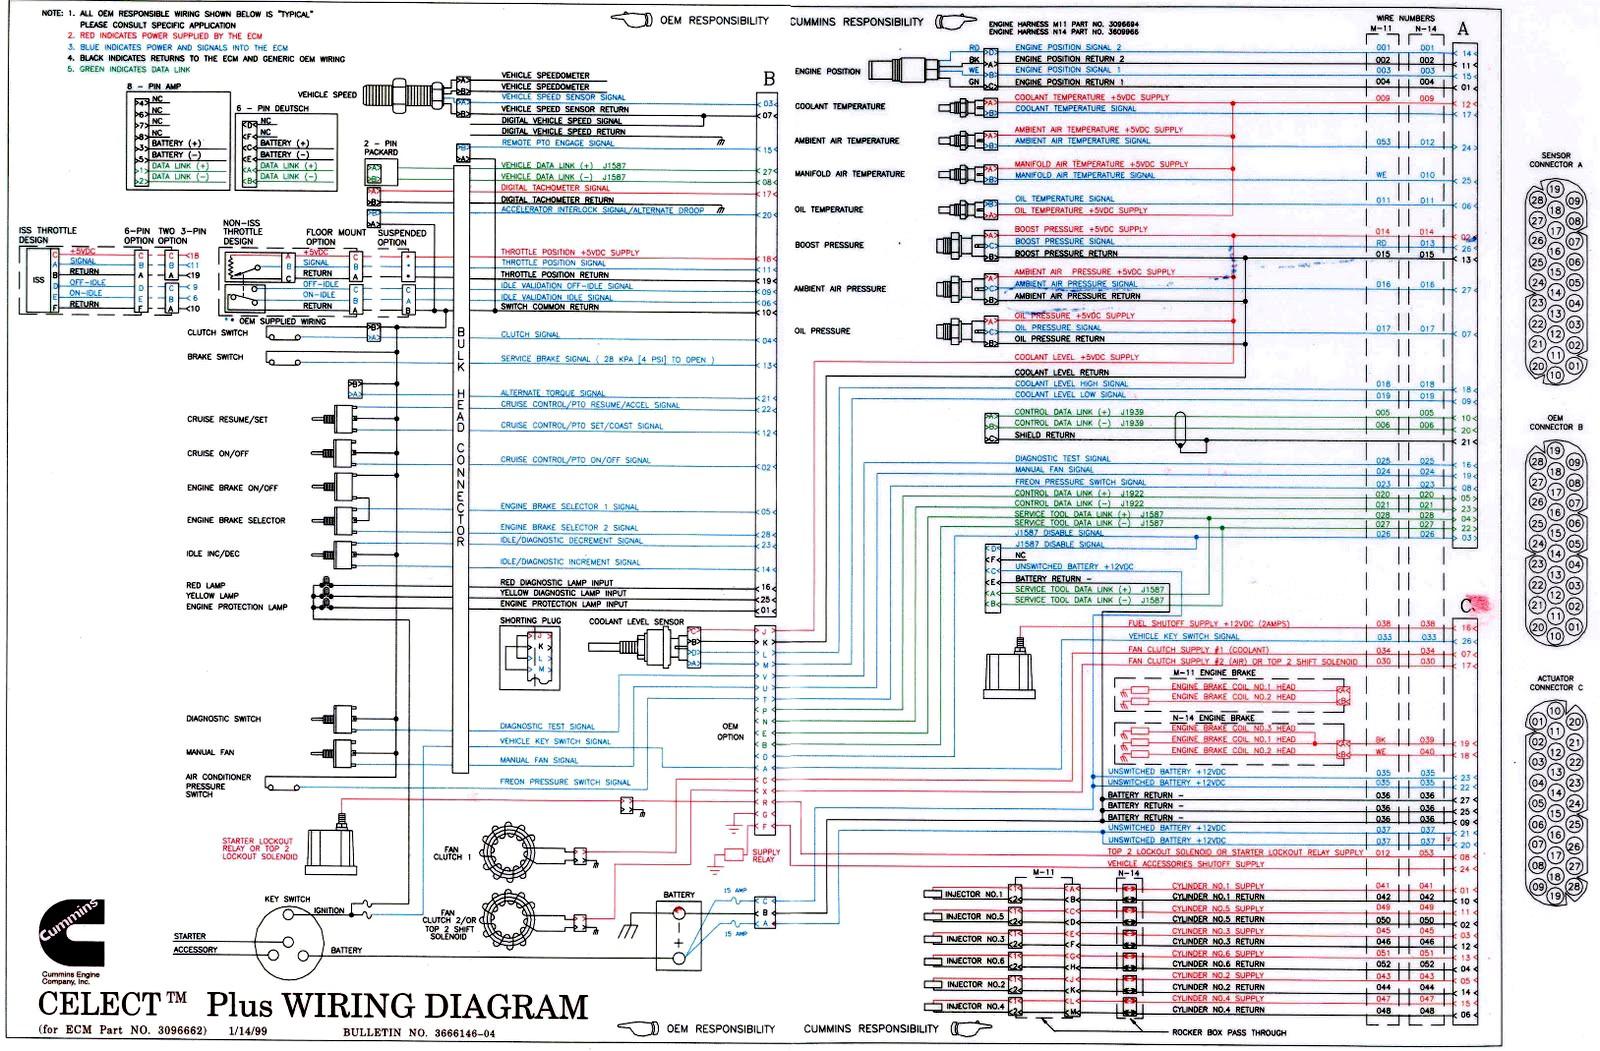 Celect+Plus+Wiring+Diagram+Cummins awesome 2004 international 4300 wiring schematic ideas International DT466 Wiring-Diagram at soozxer.org